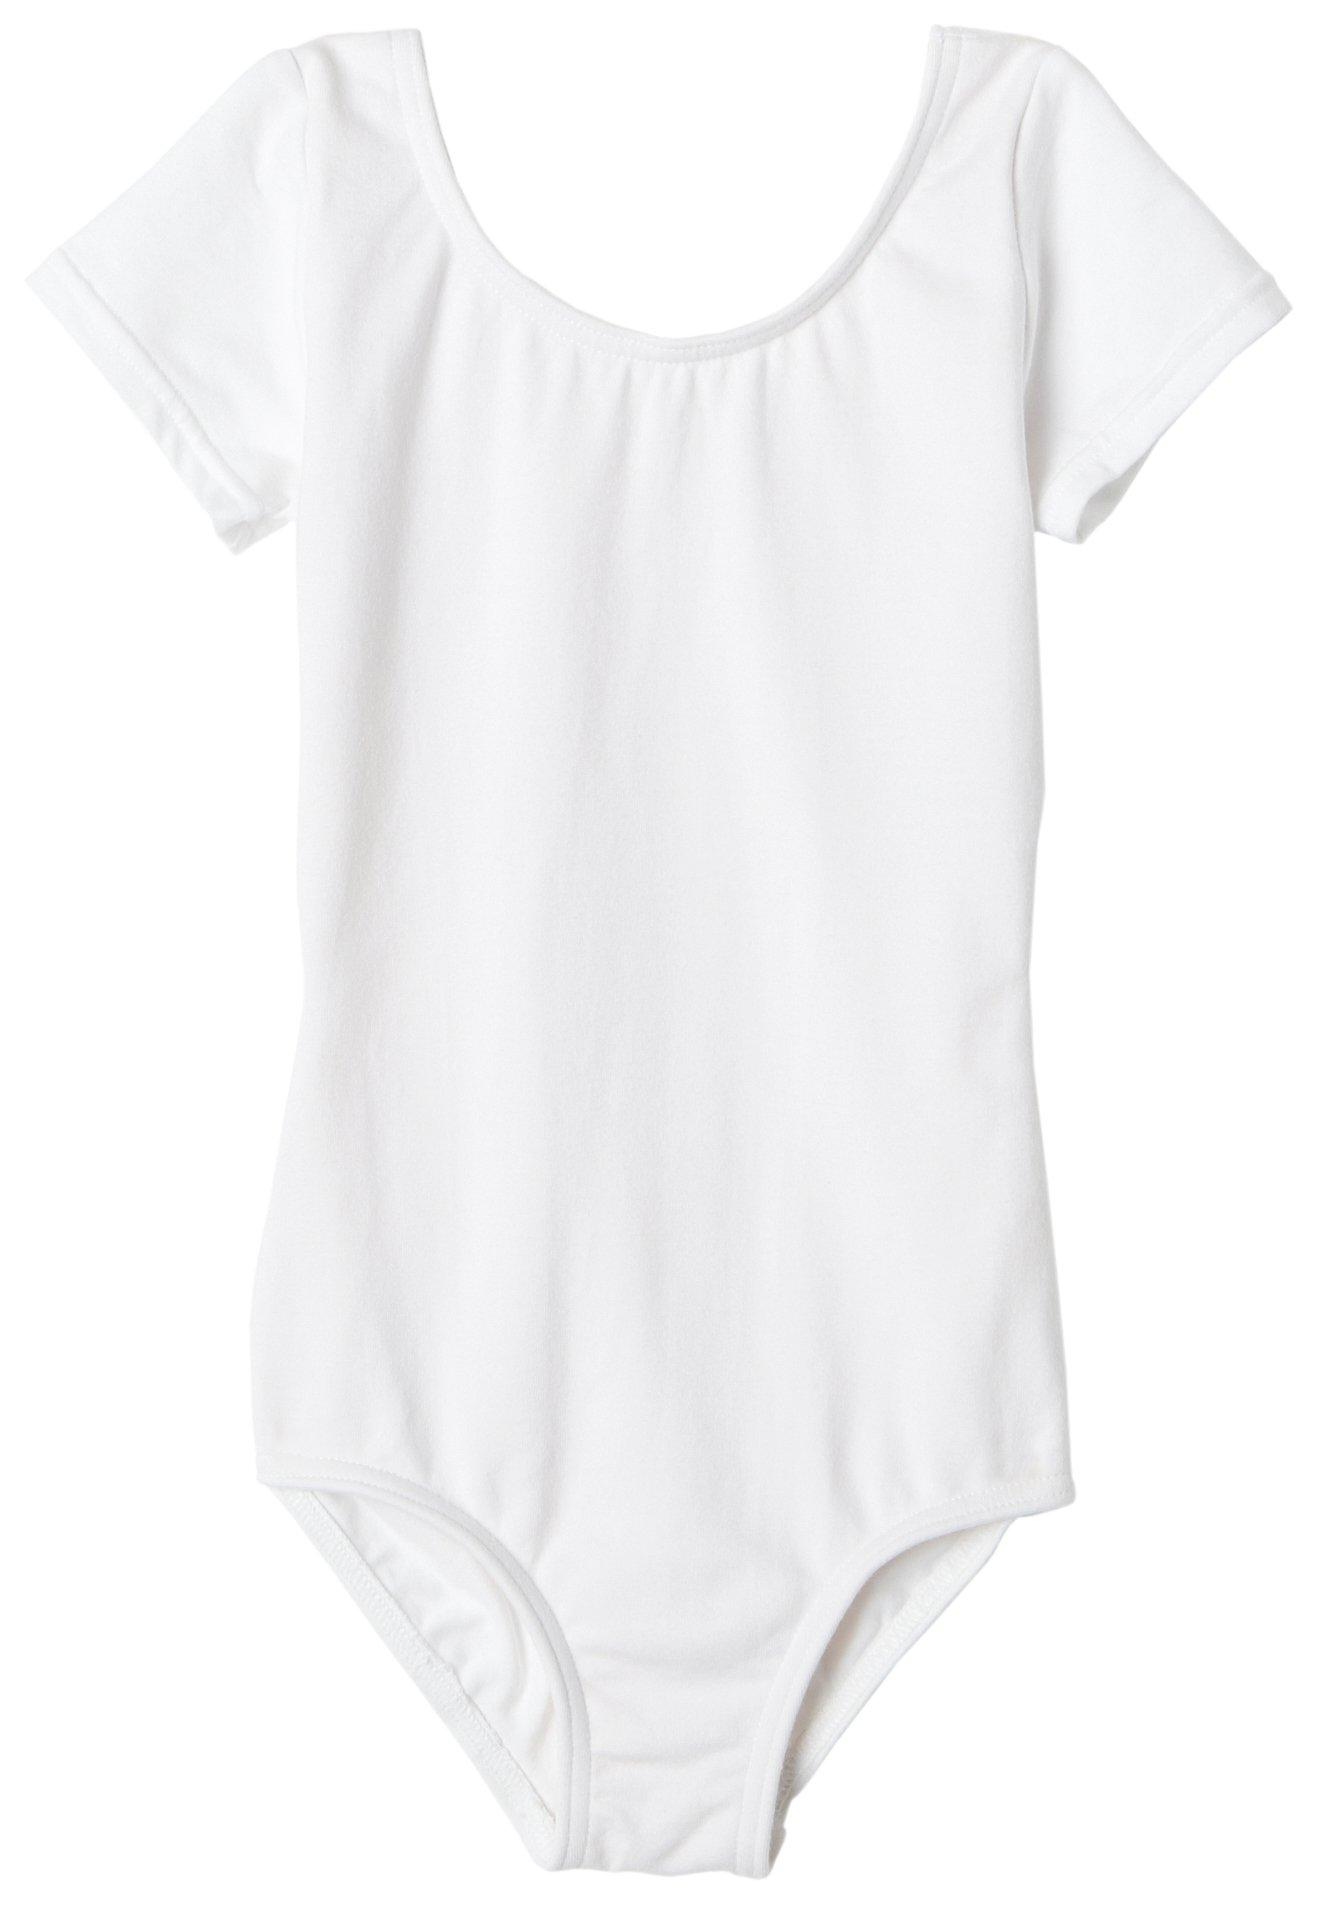 Capezio Little Girls' Classic Short Sleeve Leotard,White,S (4-6) by Capezio